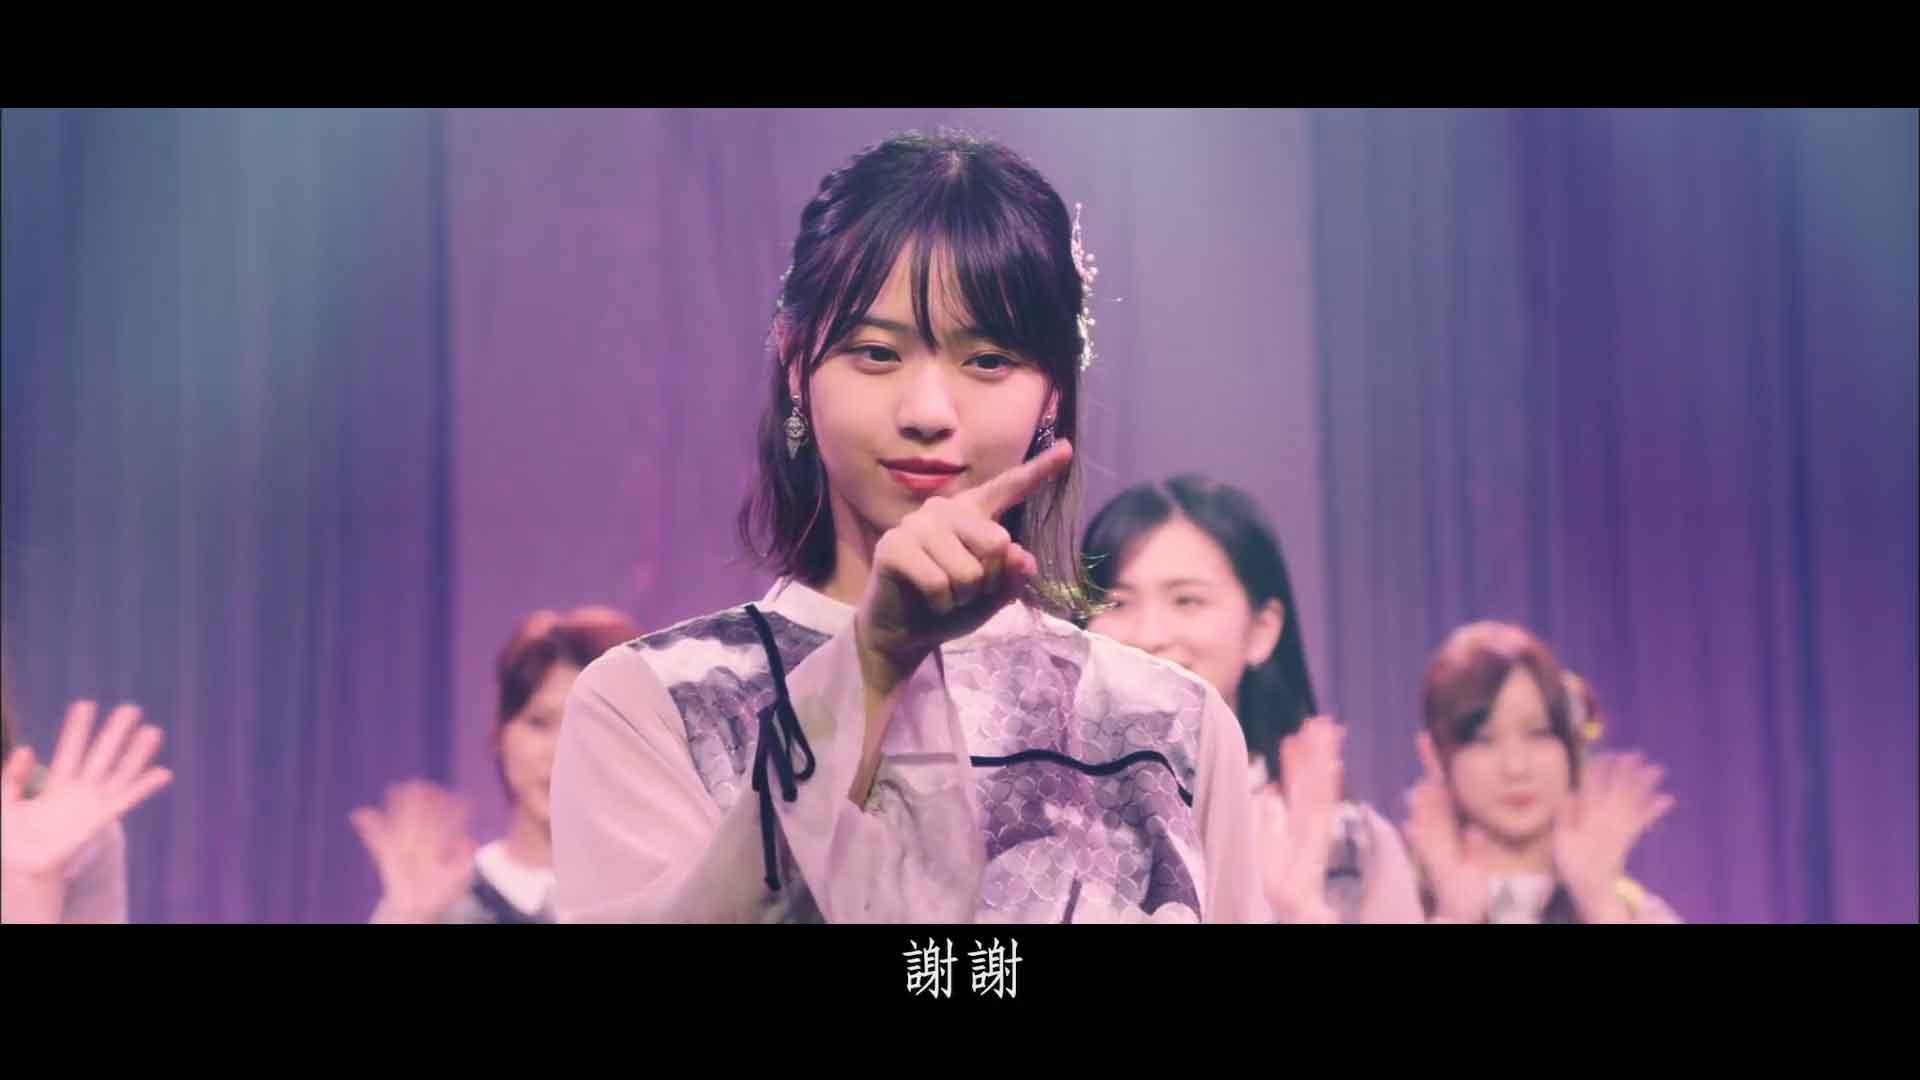 [1080P] 乃木坂46 -  想绕远路回家 (中文字幕版)